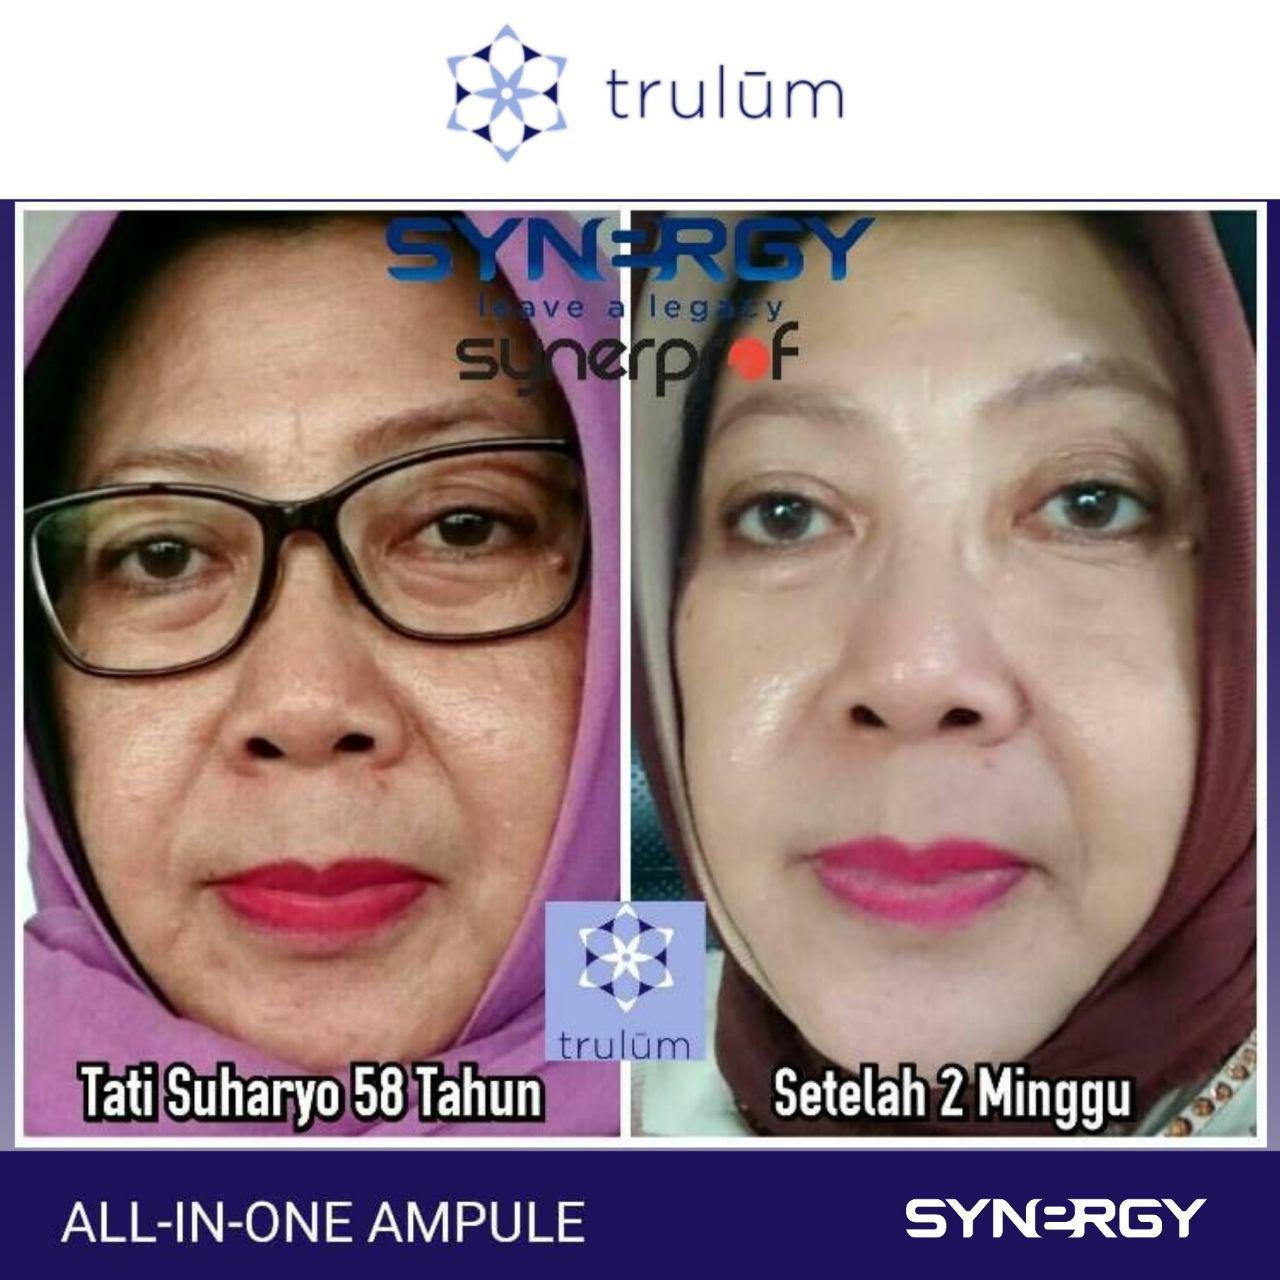 Tempat FacialArtis di Temanggung WA: 08112338376